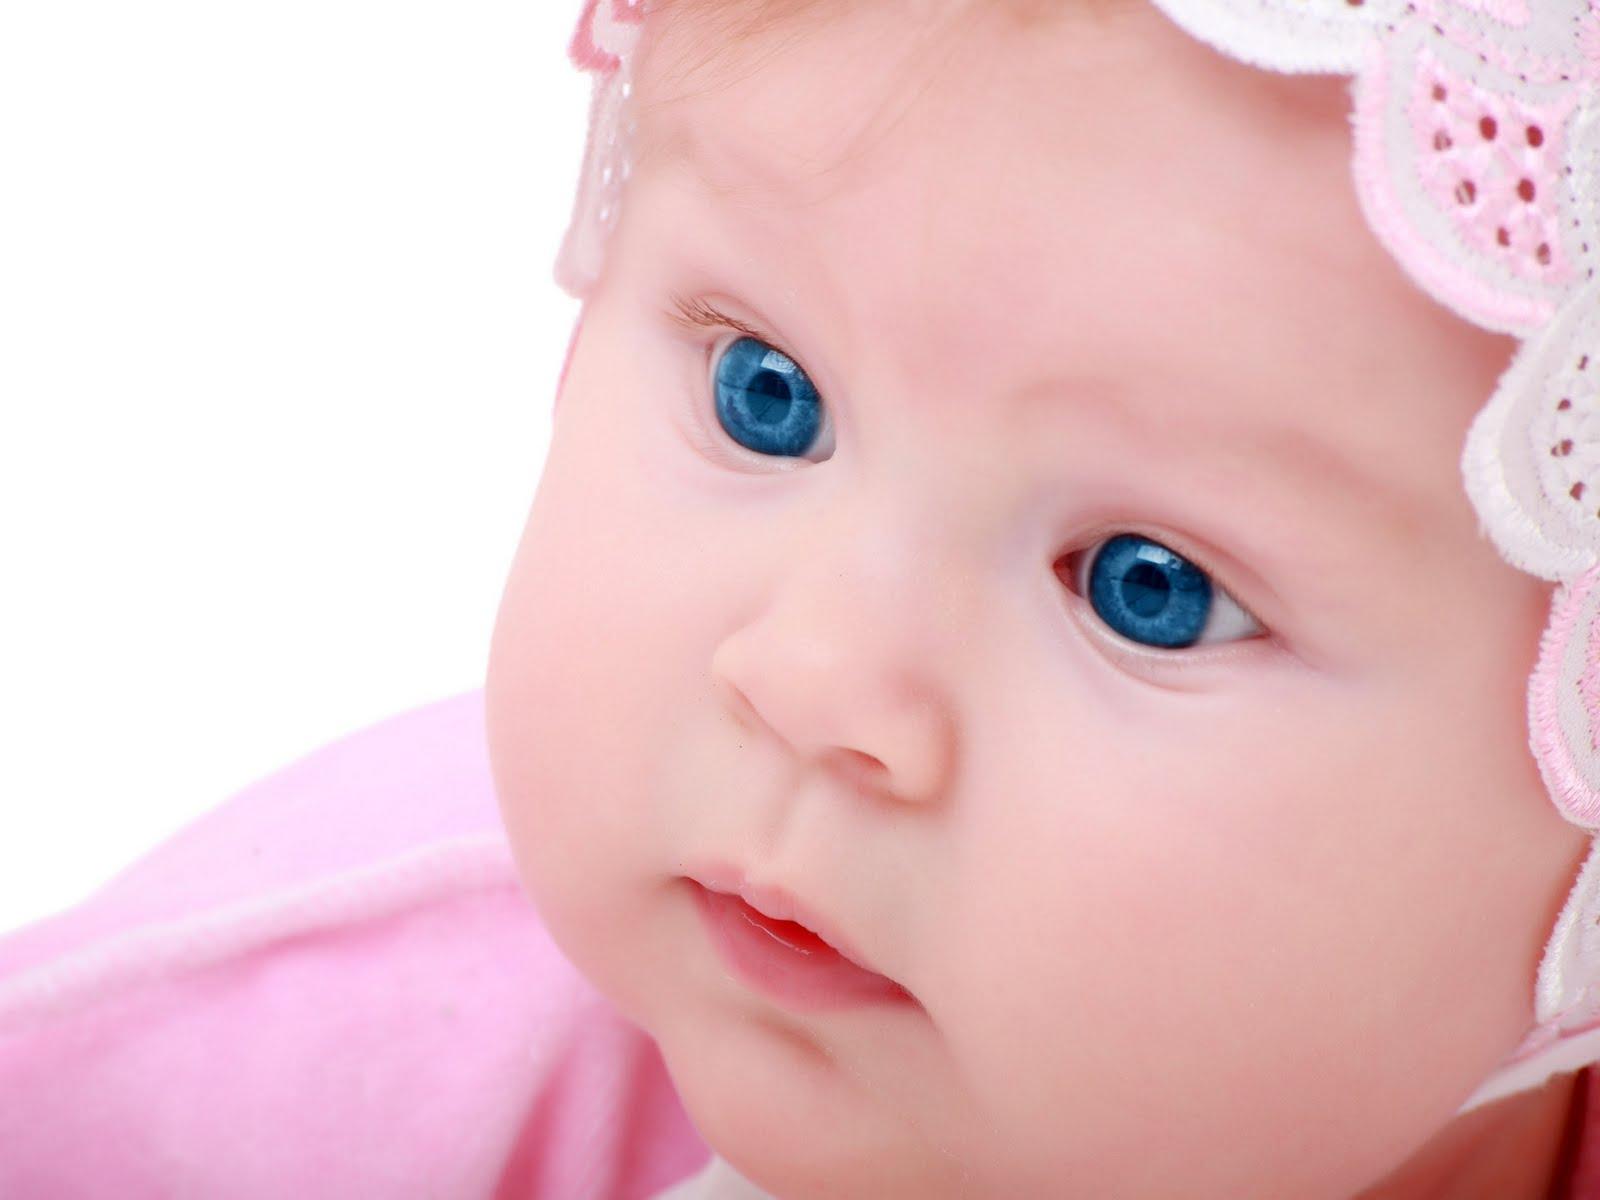 http://1.bp.blogspot.com/-Ng9cf1Un2U0/TlXL7pTwU3I/AAAAAAAAAik/kfiy_YjEGiM/s1600/cute-baby-high-resolution-wallpapers.jpg